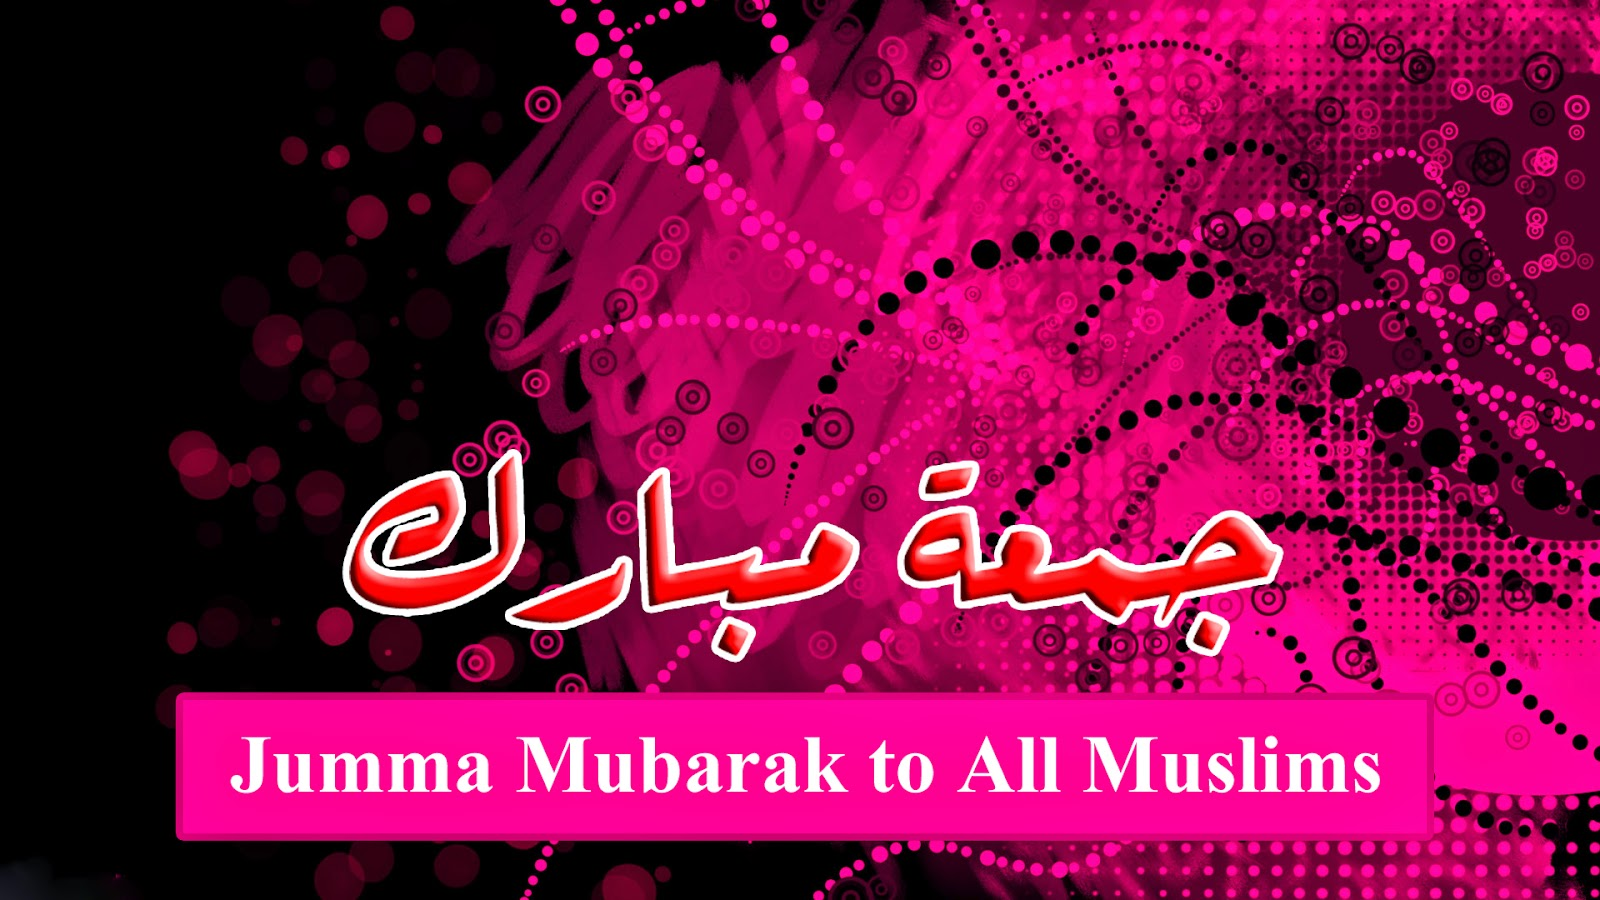 Jumma Mubarak 2014 Wallpaper Download Neha Sharma Hd Wallpapers